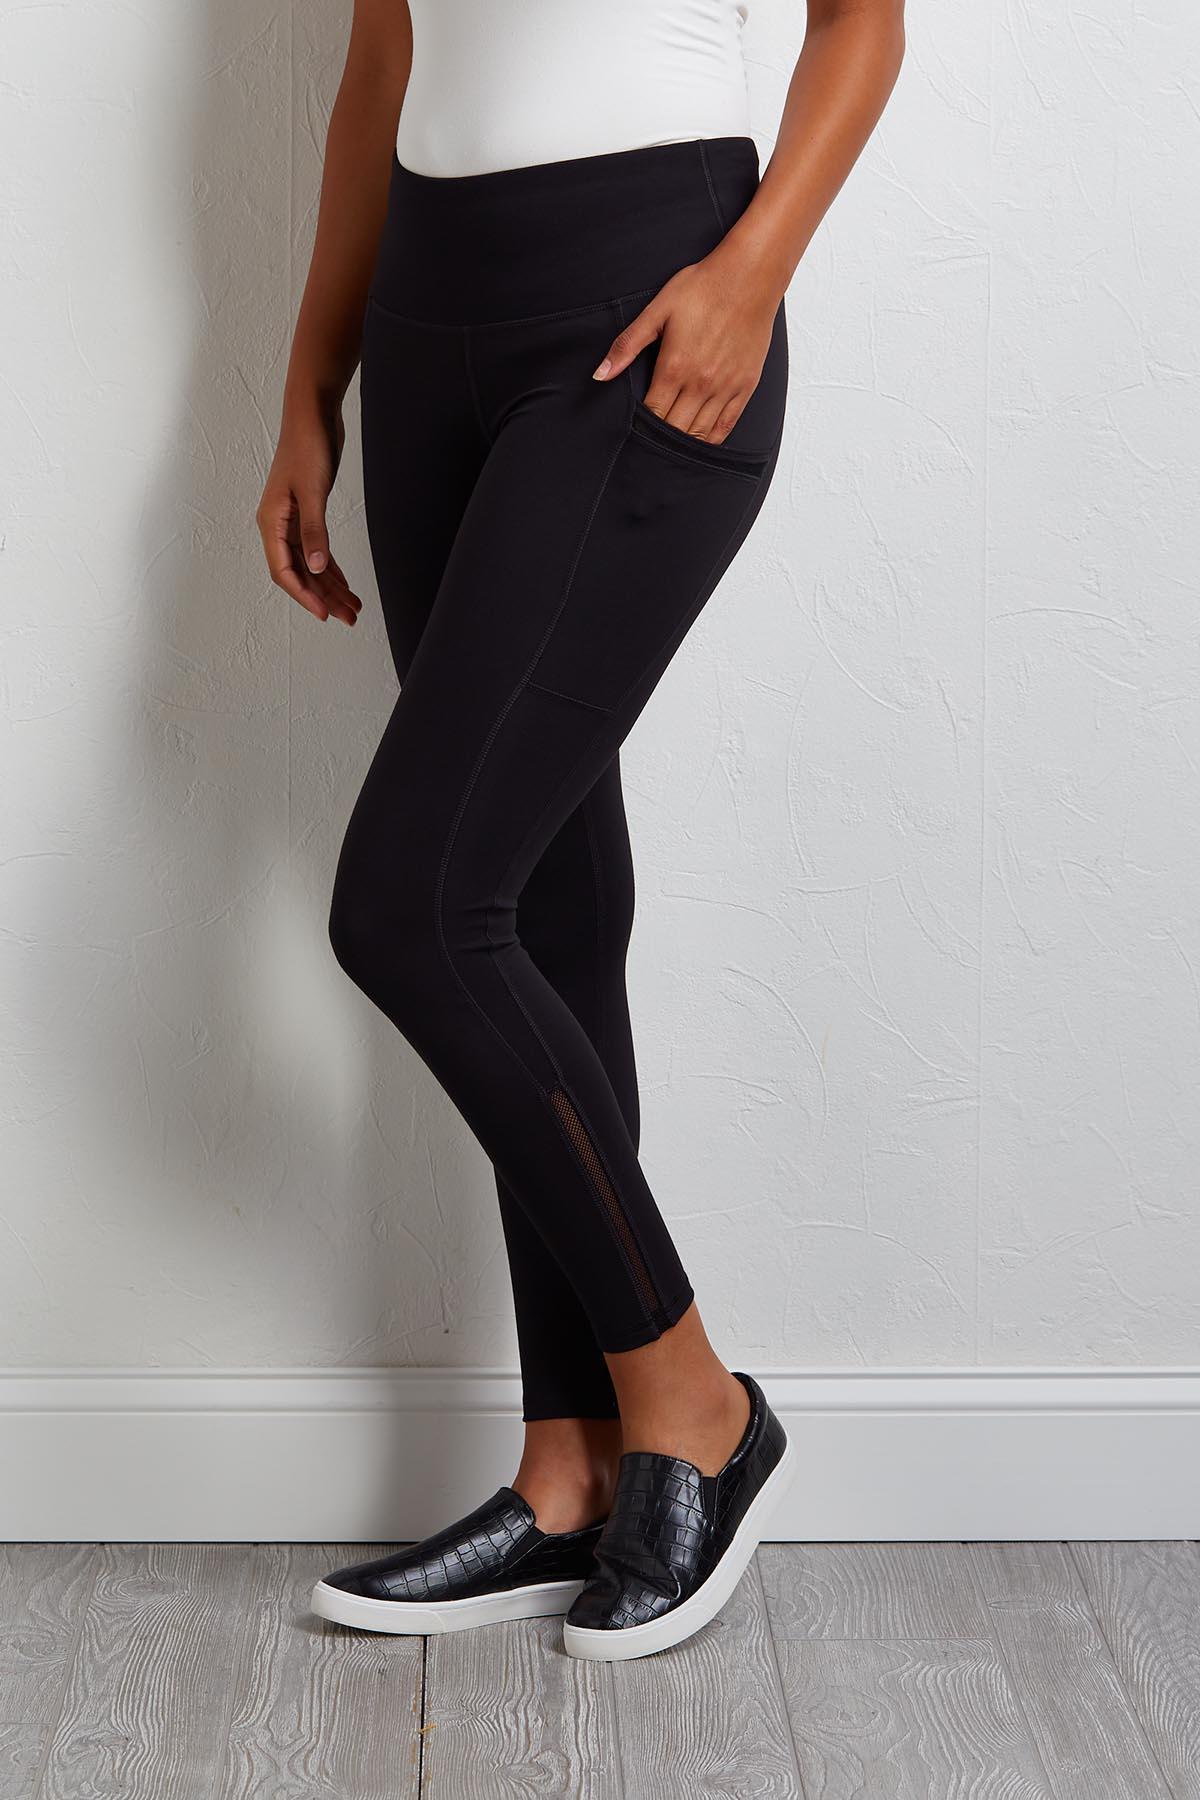 Athleisure Pocket Leggings